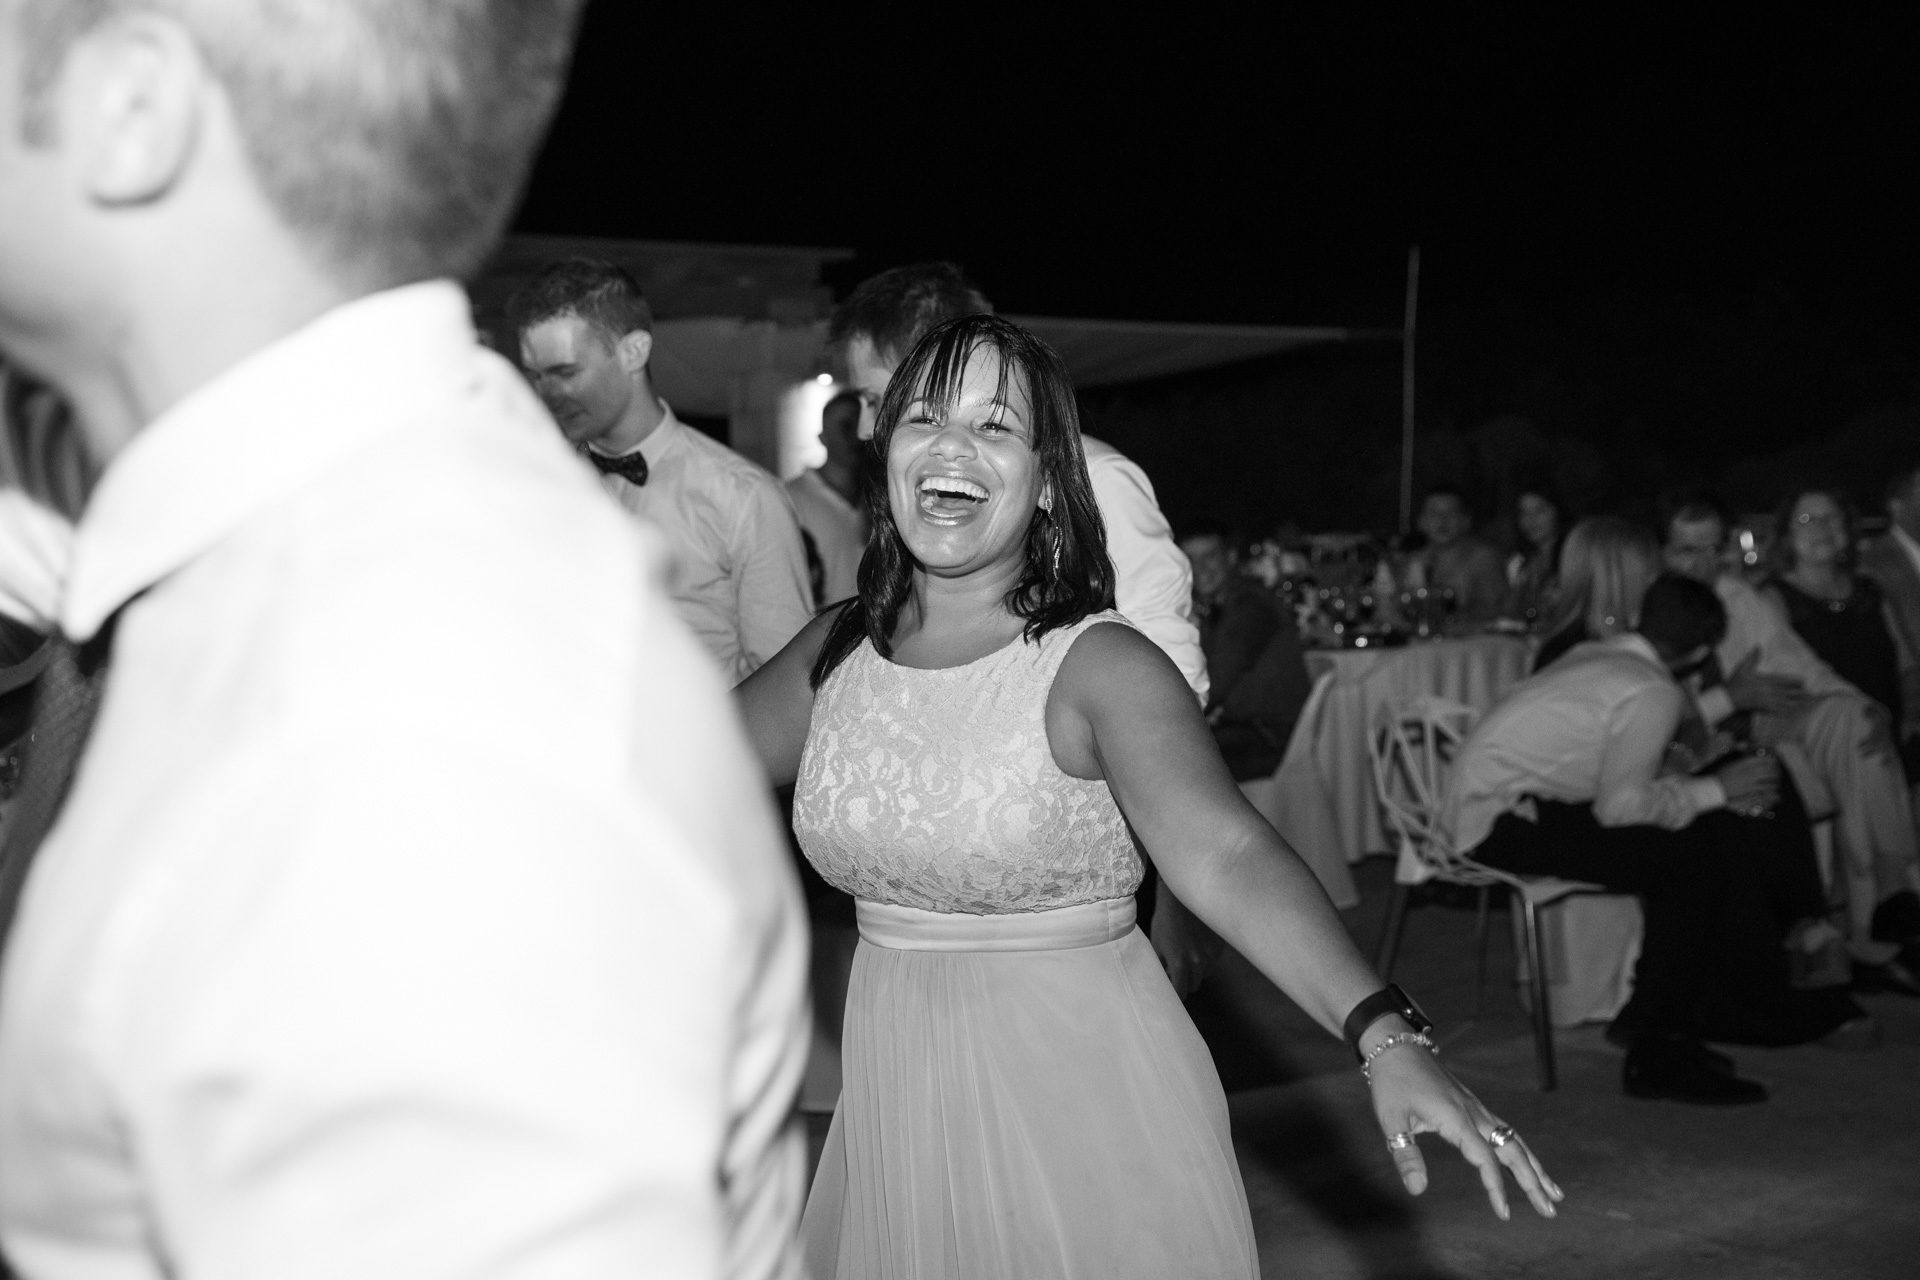 Fotografoi Sparti Fotografoi Spartis φωτογραφοι σπαρτη φωτογραφοι σπαρτης,αλεξανδρακης δημητρης Alexandrakis Alexandrakis Photography (54)